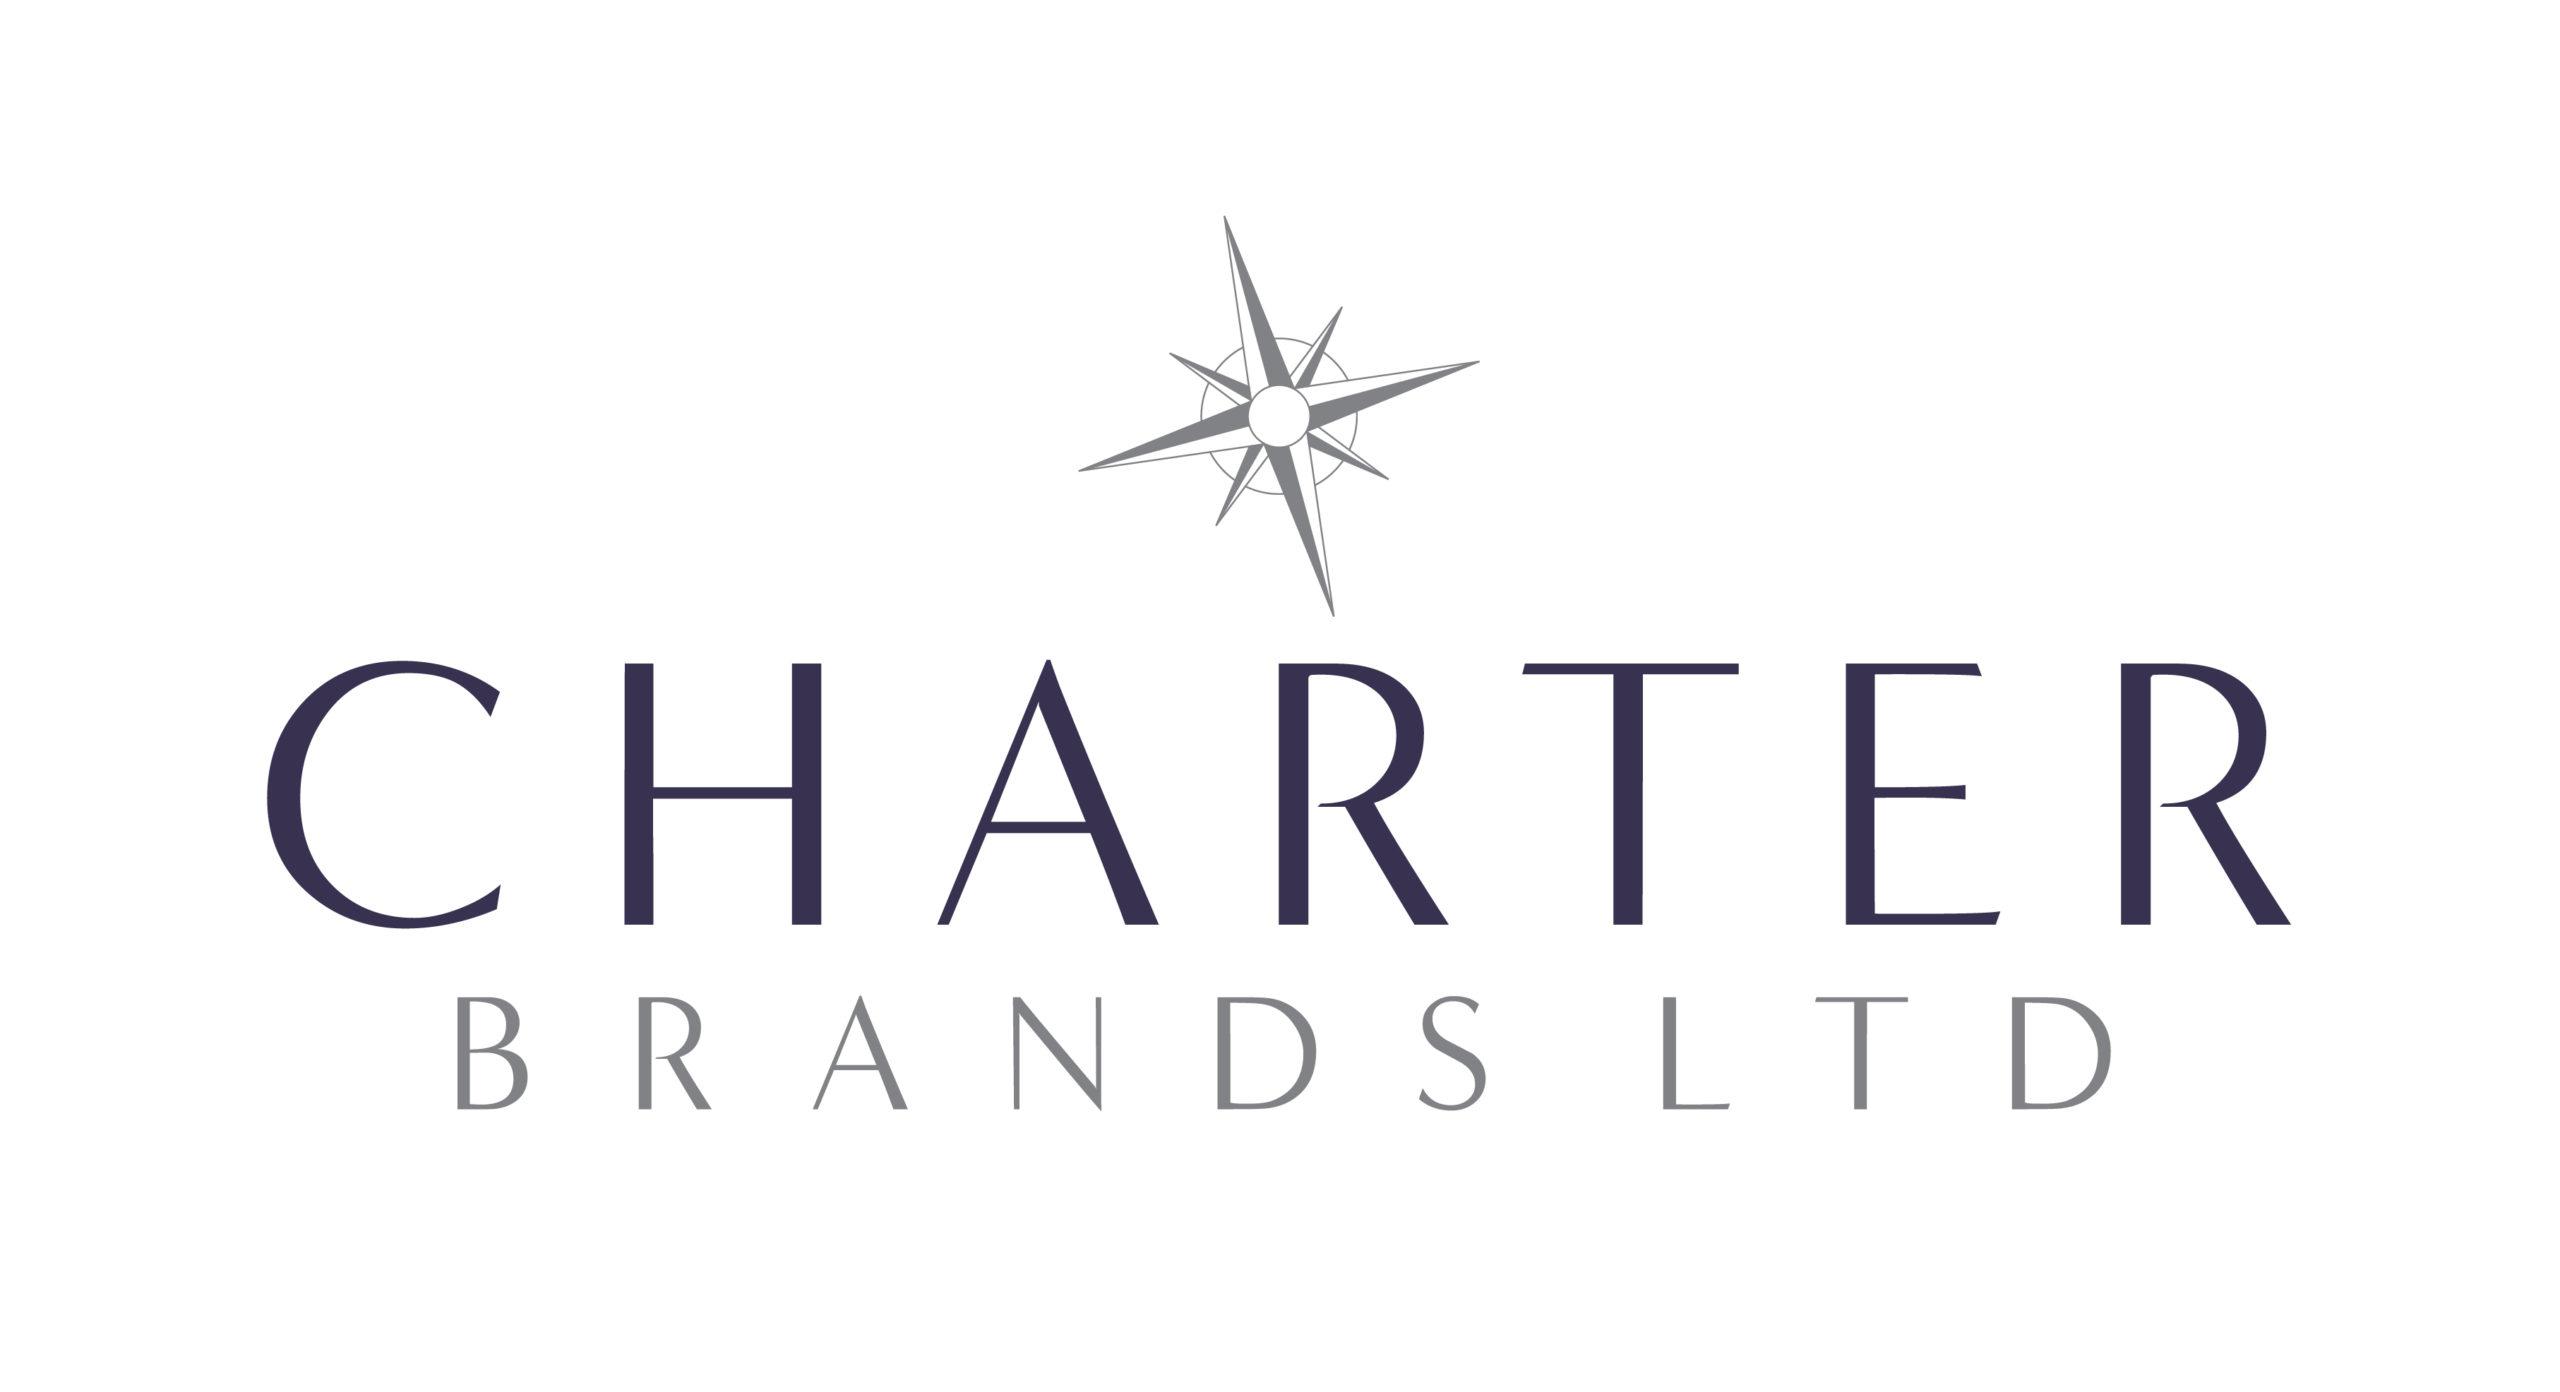 Linked logo for Charter Brands Ltd.